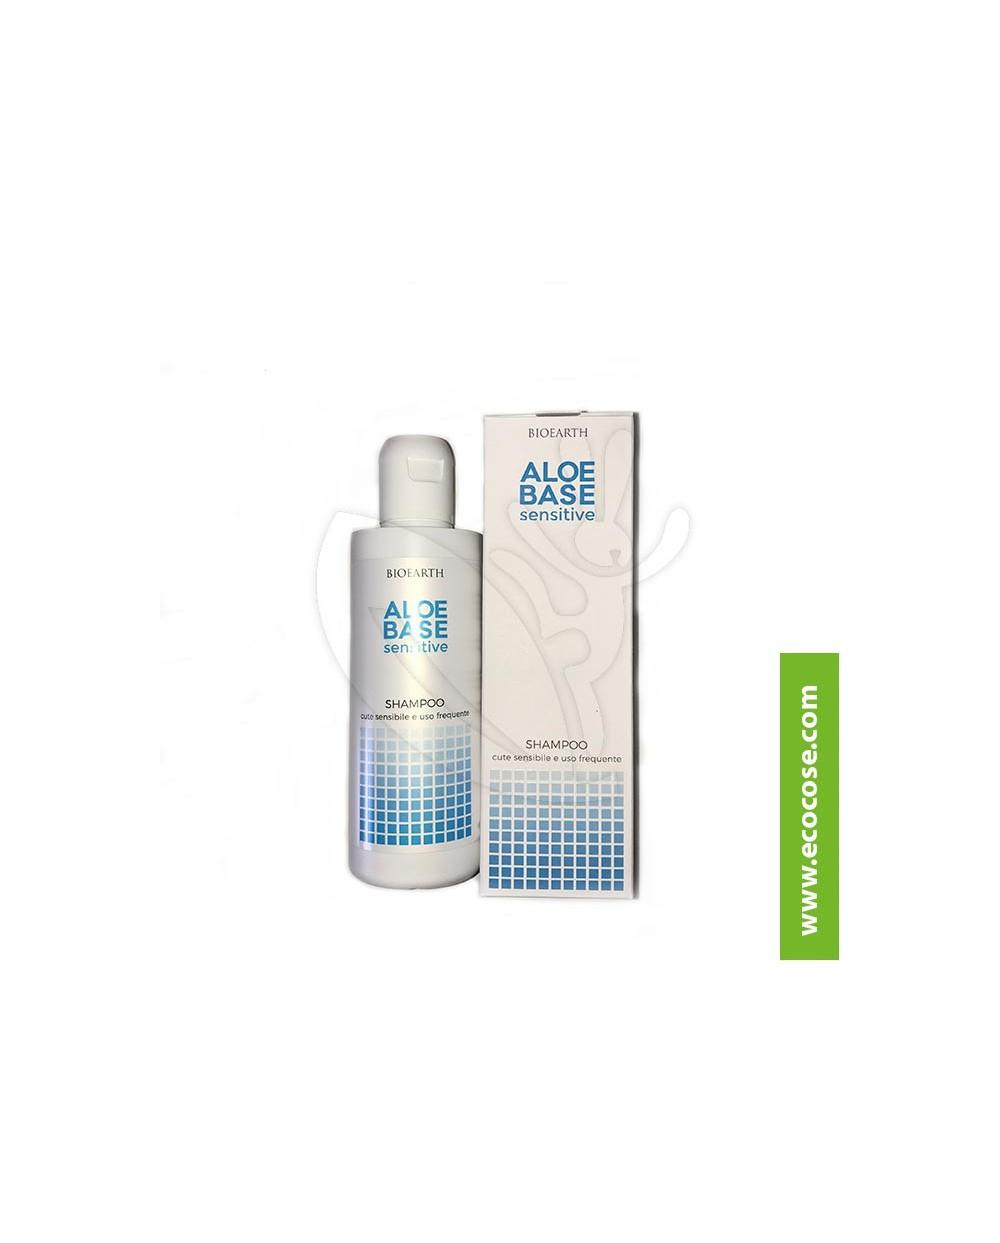 Bioearth - Aloebase Sensitive - Shampoo cute sensibile e uso frequente